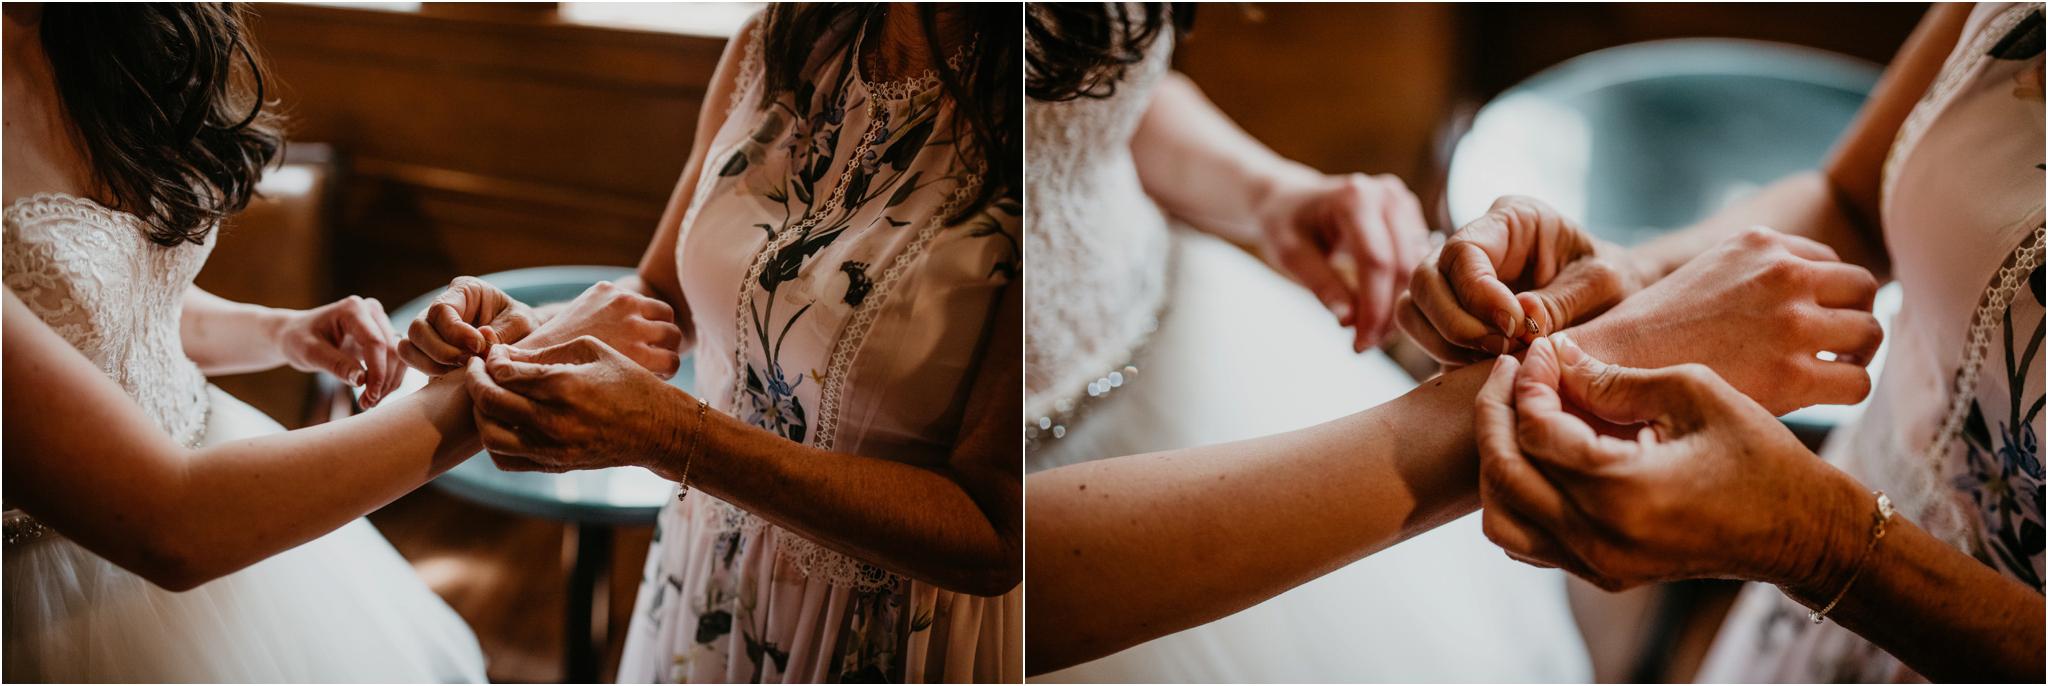 chance-and-ondrea-lairmont-manor-wedding-seattle-photographer-014.jpg